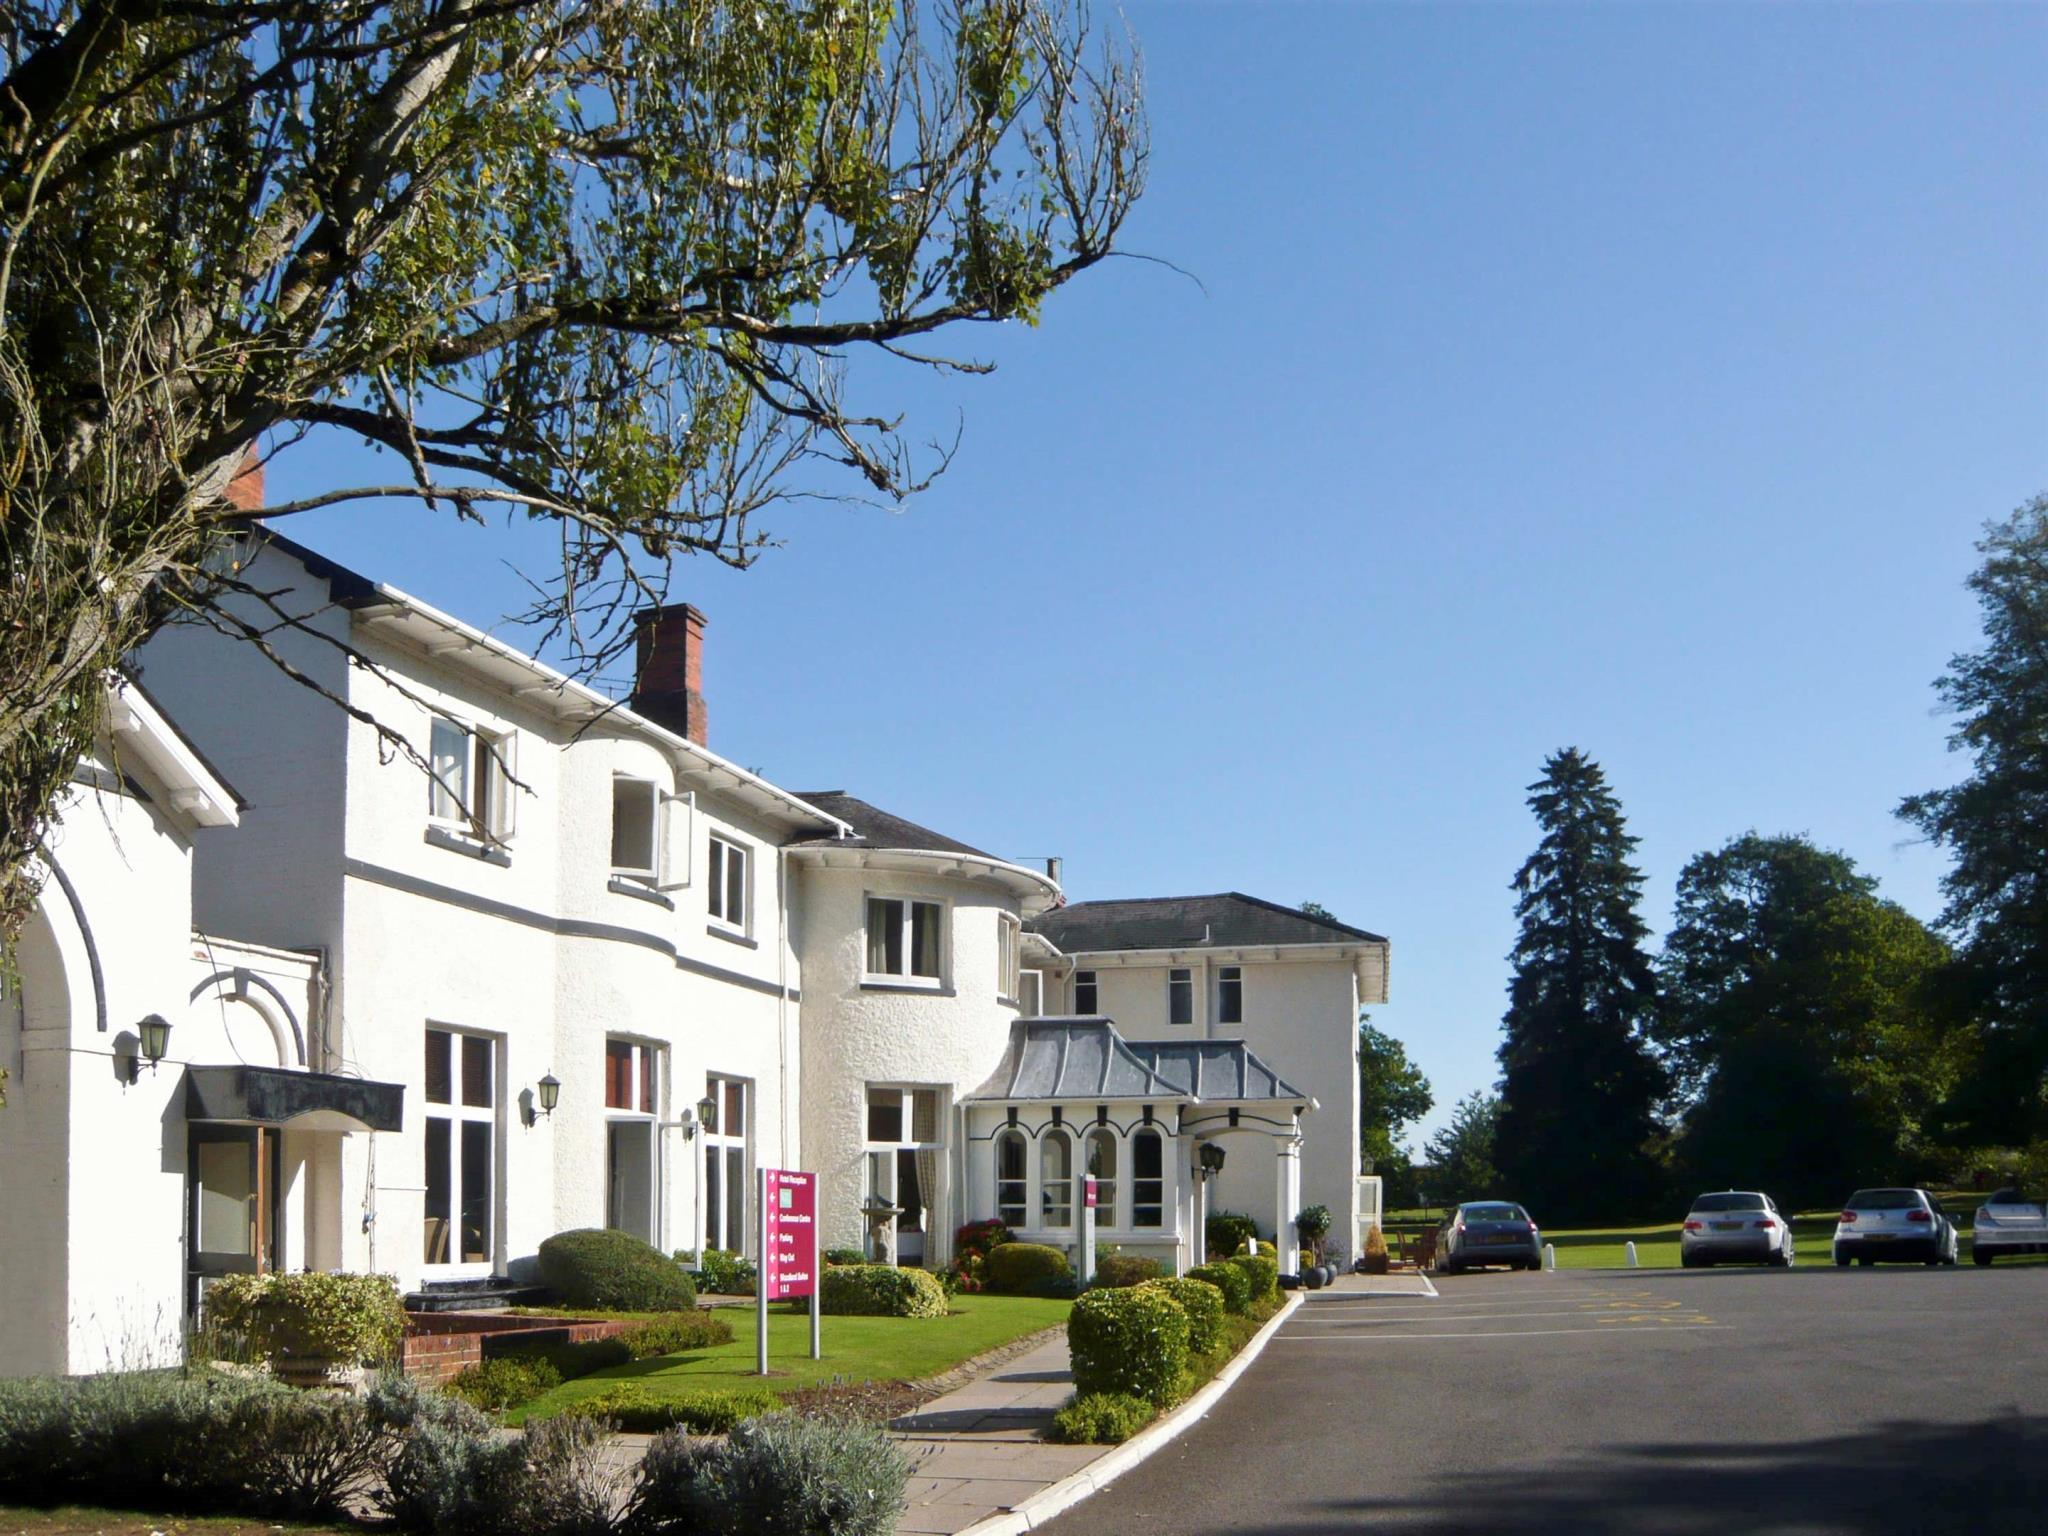 Mercure Brandon Hall Hotel And Spa Warwickshire, Warwickshire